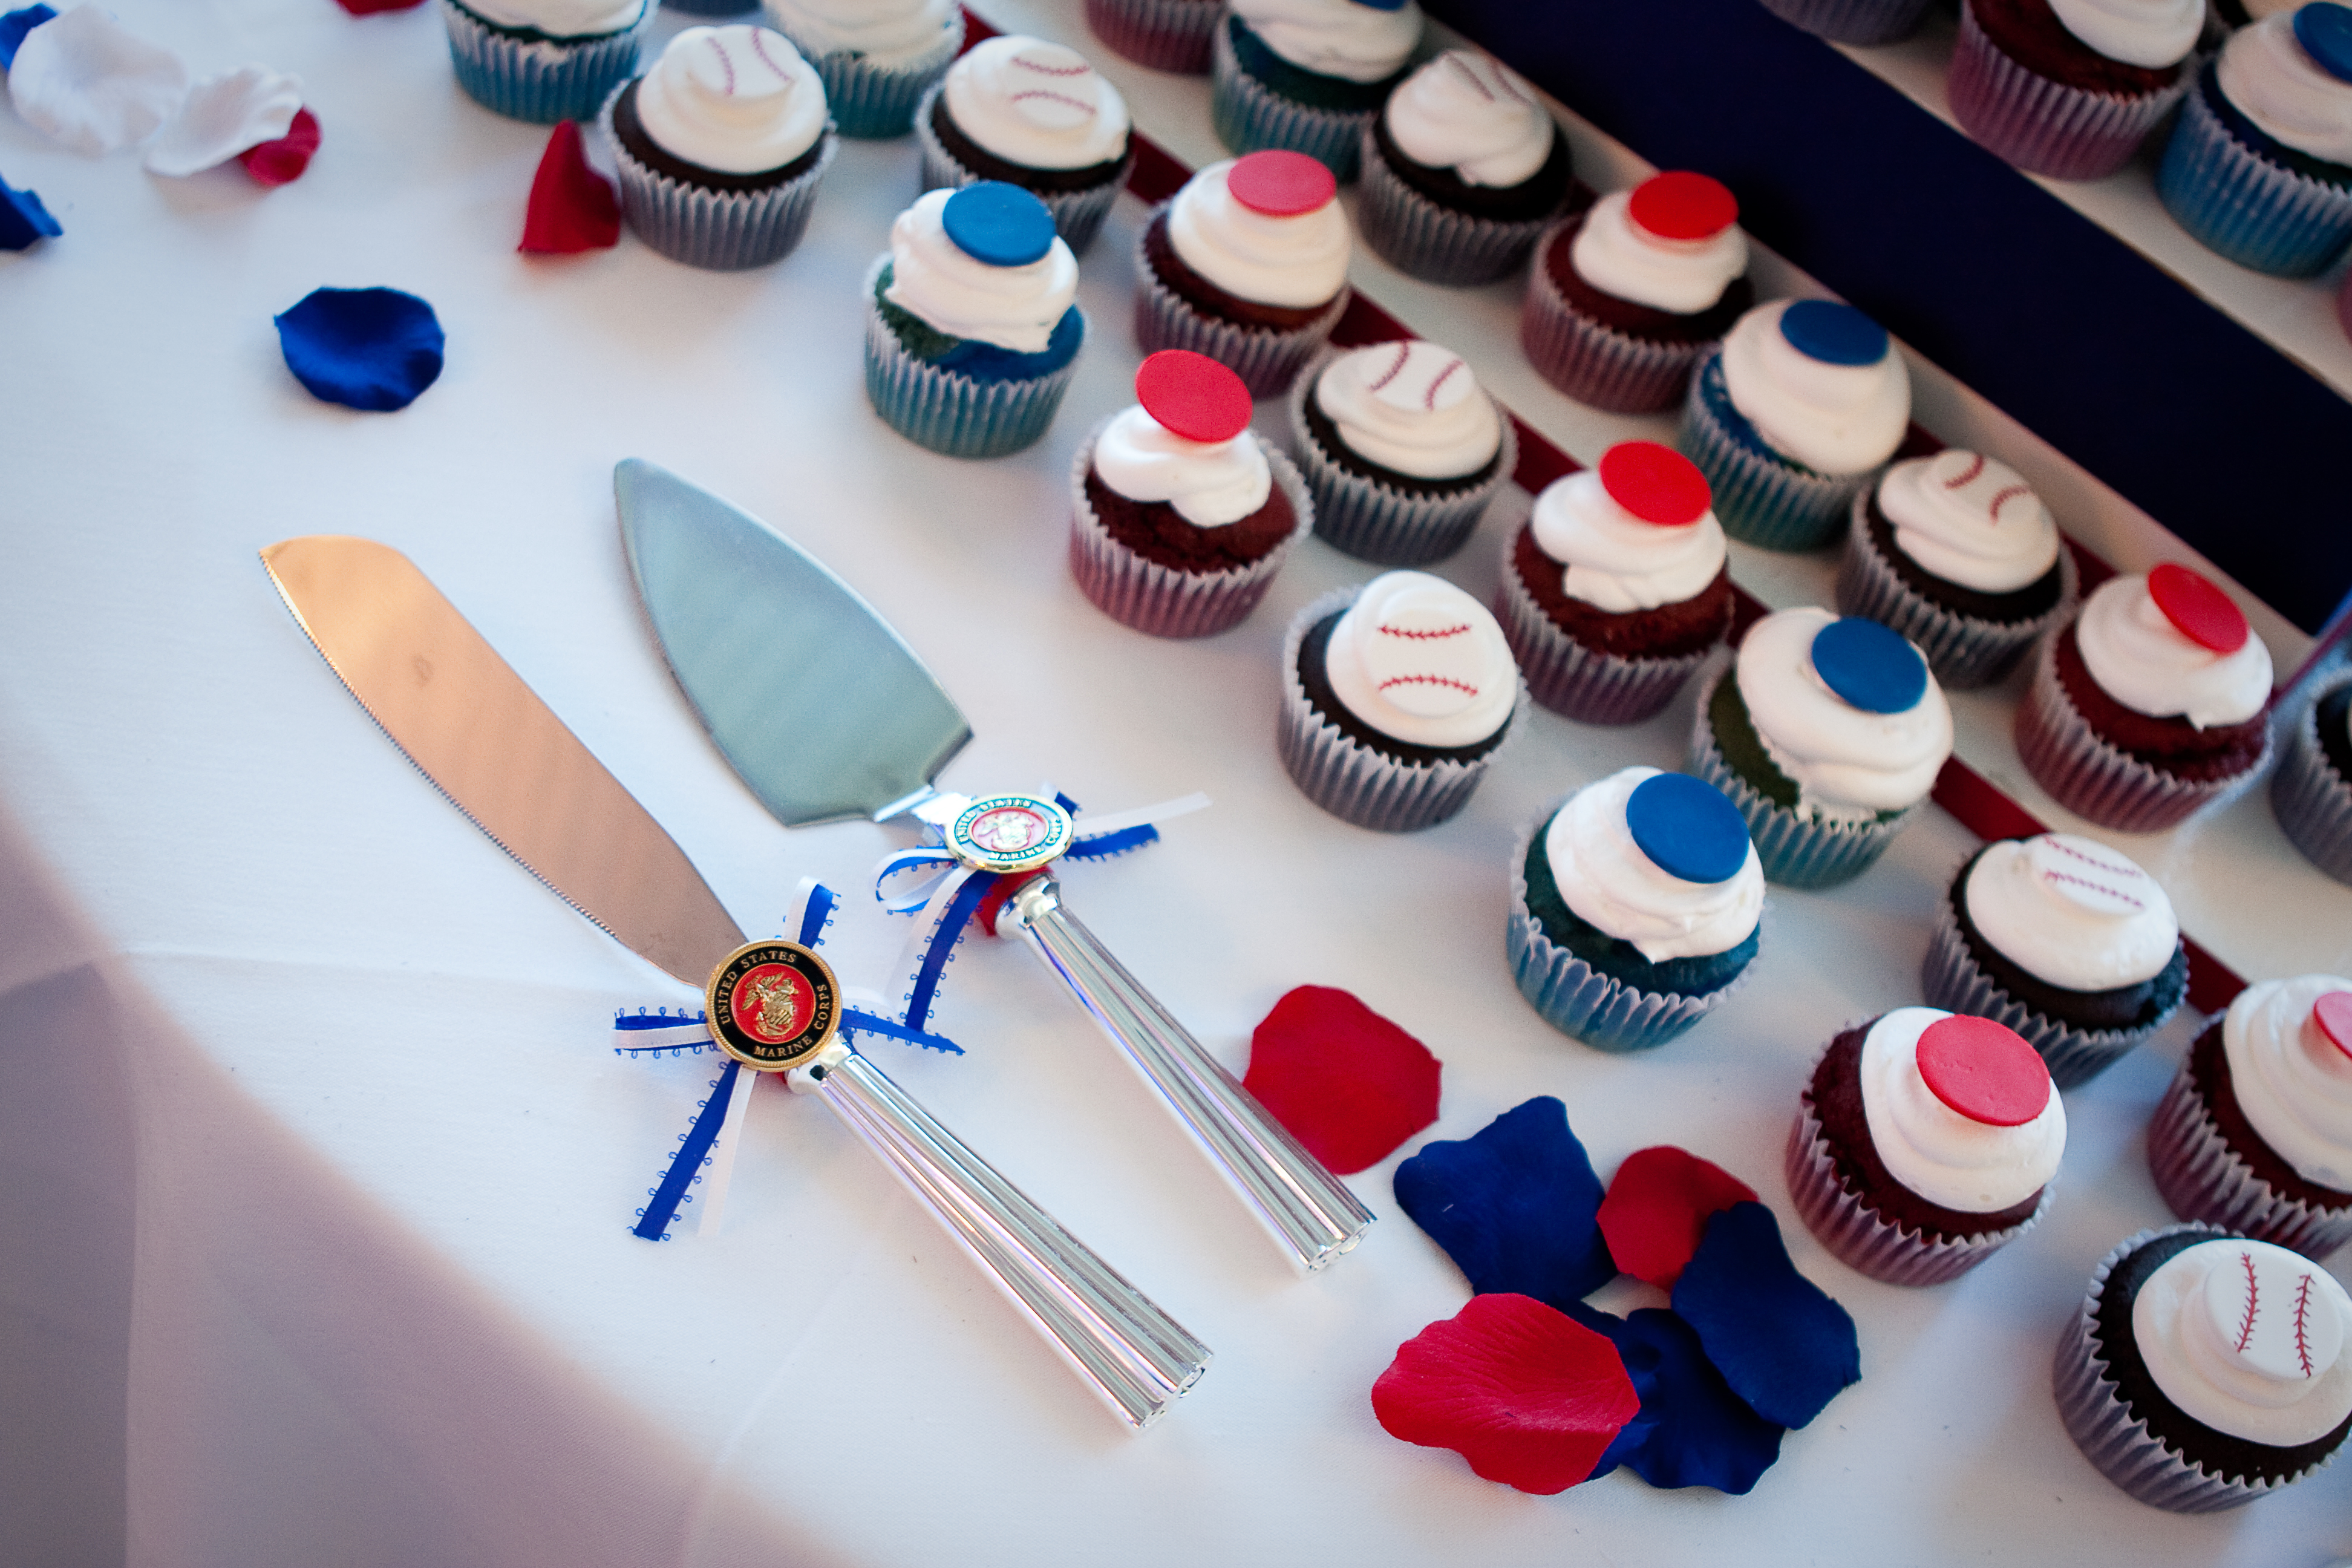 Beauty, Photography, Cakes, white, red, blue, cake, Makeup, Sweet, Baseball, A, Design, Hollis, Cari